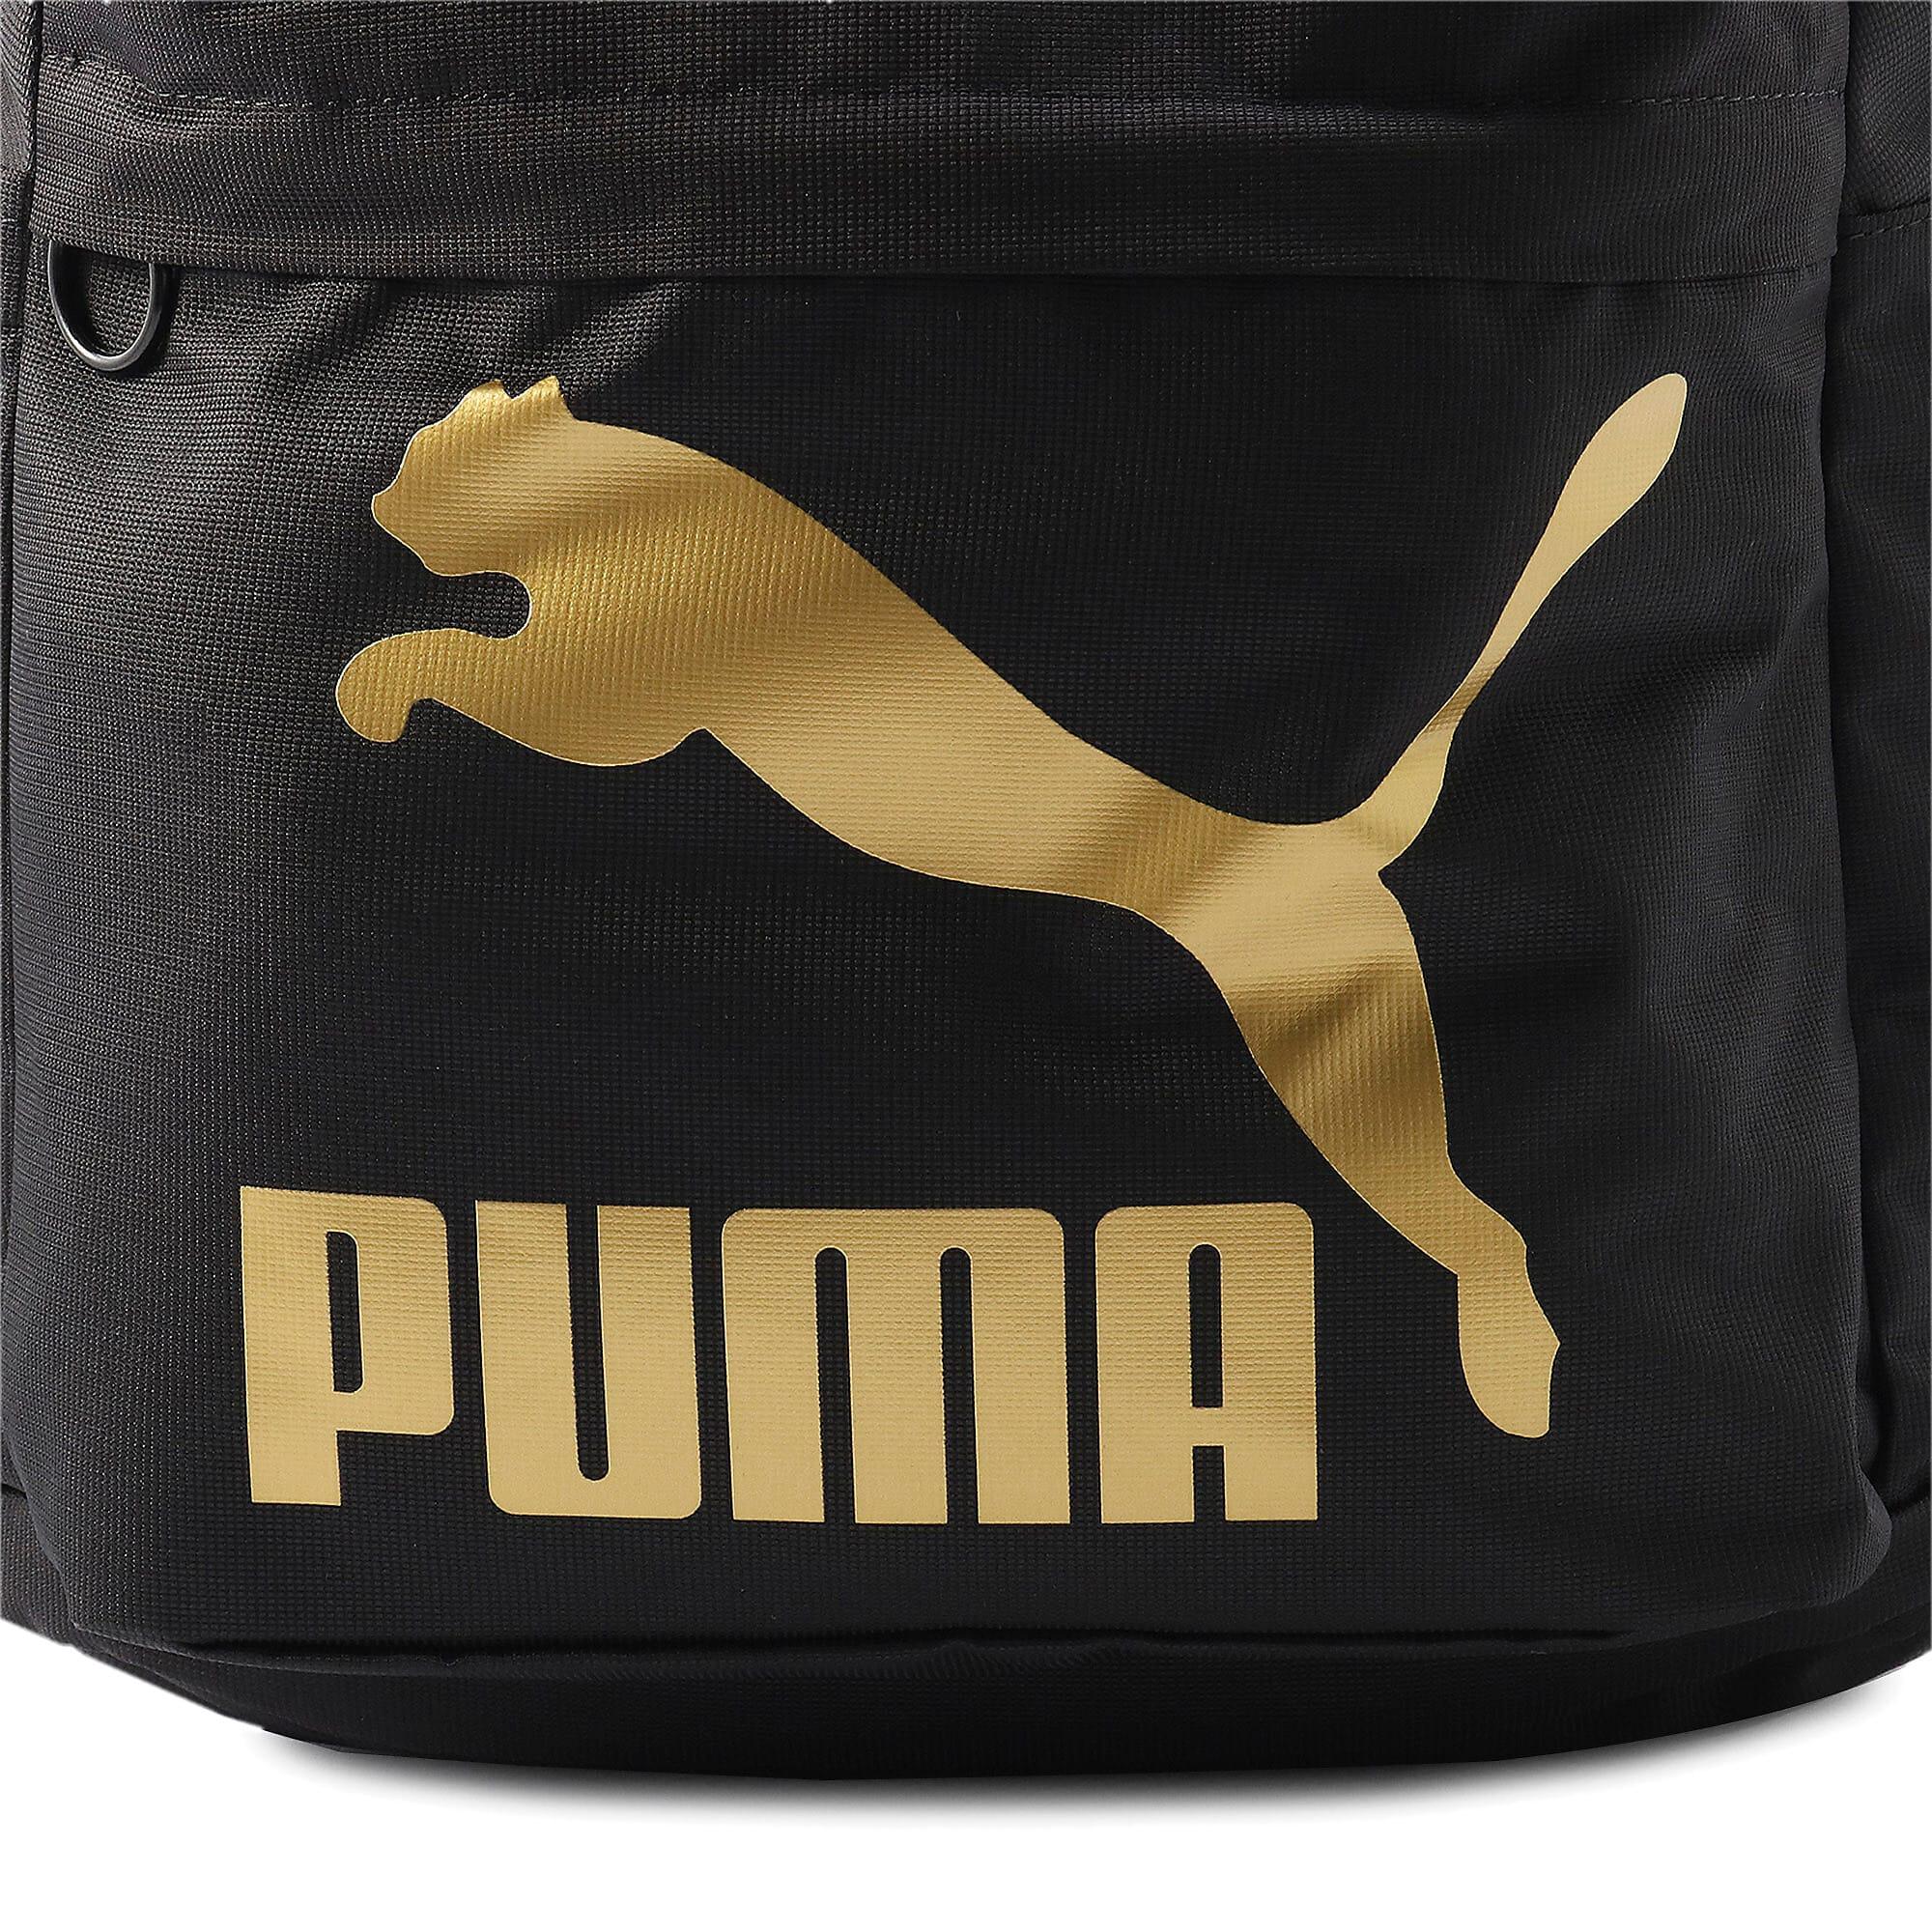 Thumbnail 5 of オリジナルス バックパック 20L, Puma Black, medium-JPN